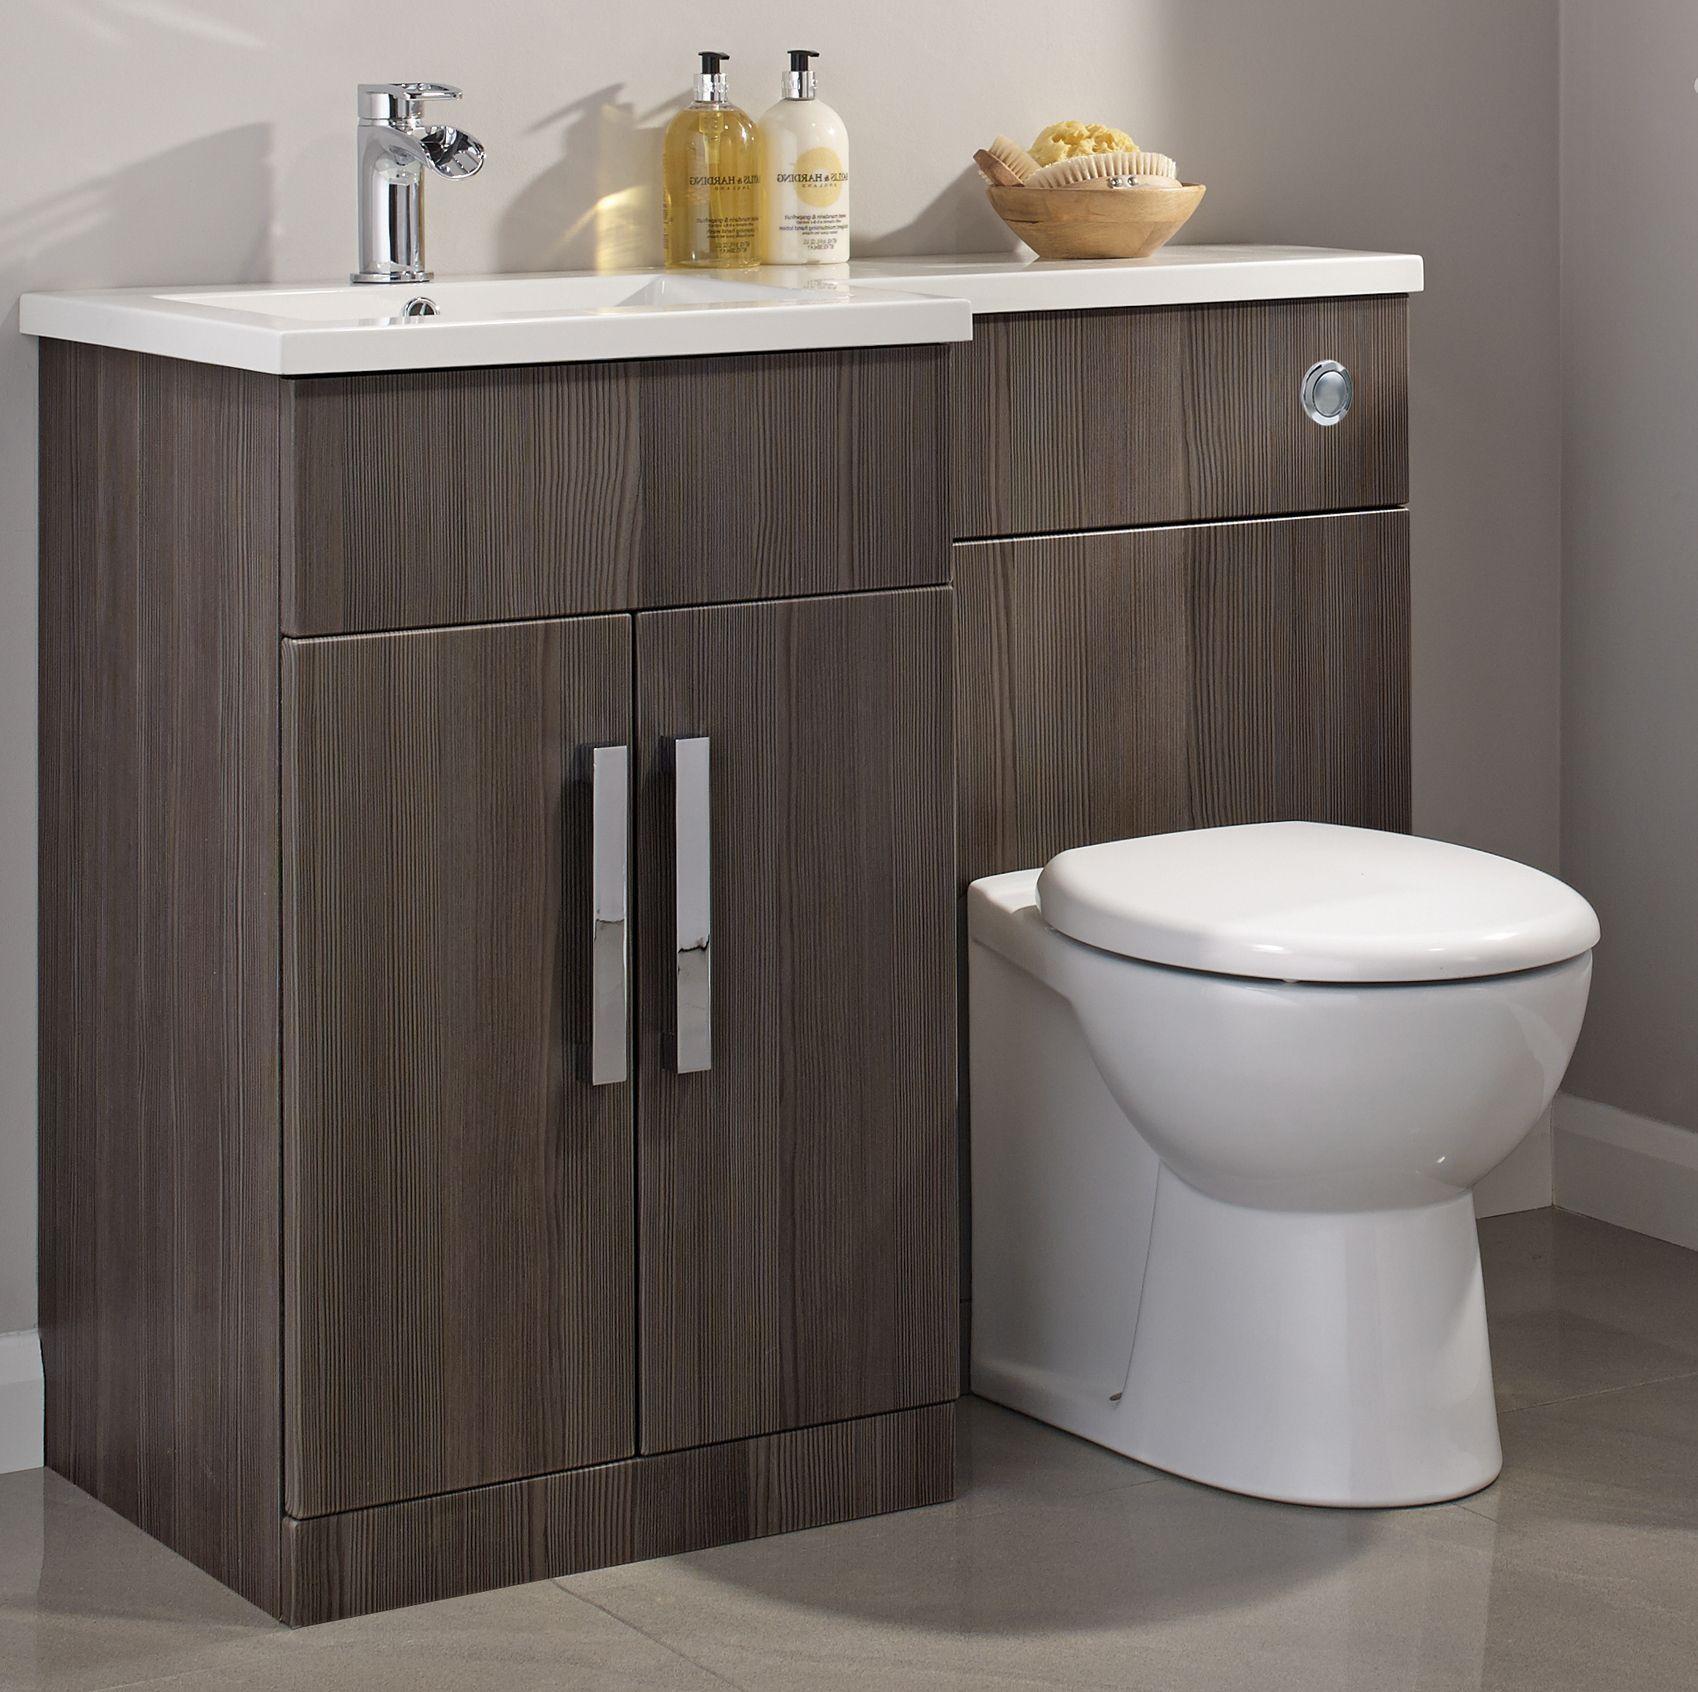 Cooke Lewis Ardesio Bodega Grey Left Handed Vanity Toilet Unit Departments Diy At B Q